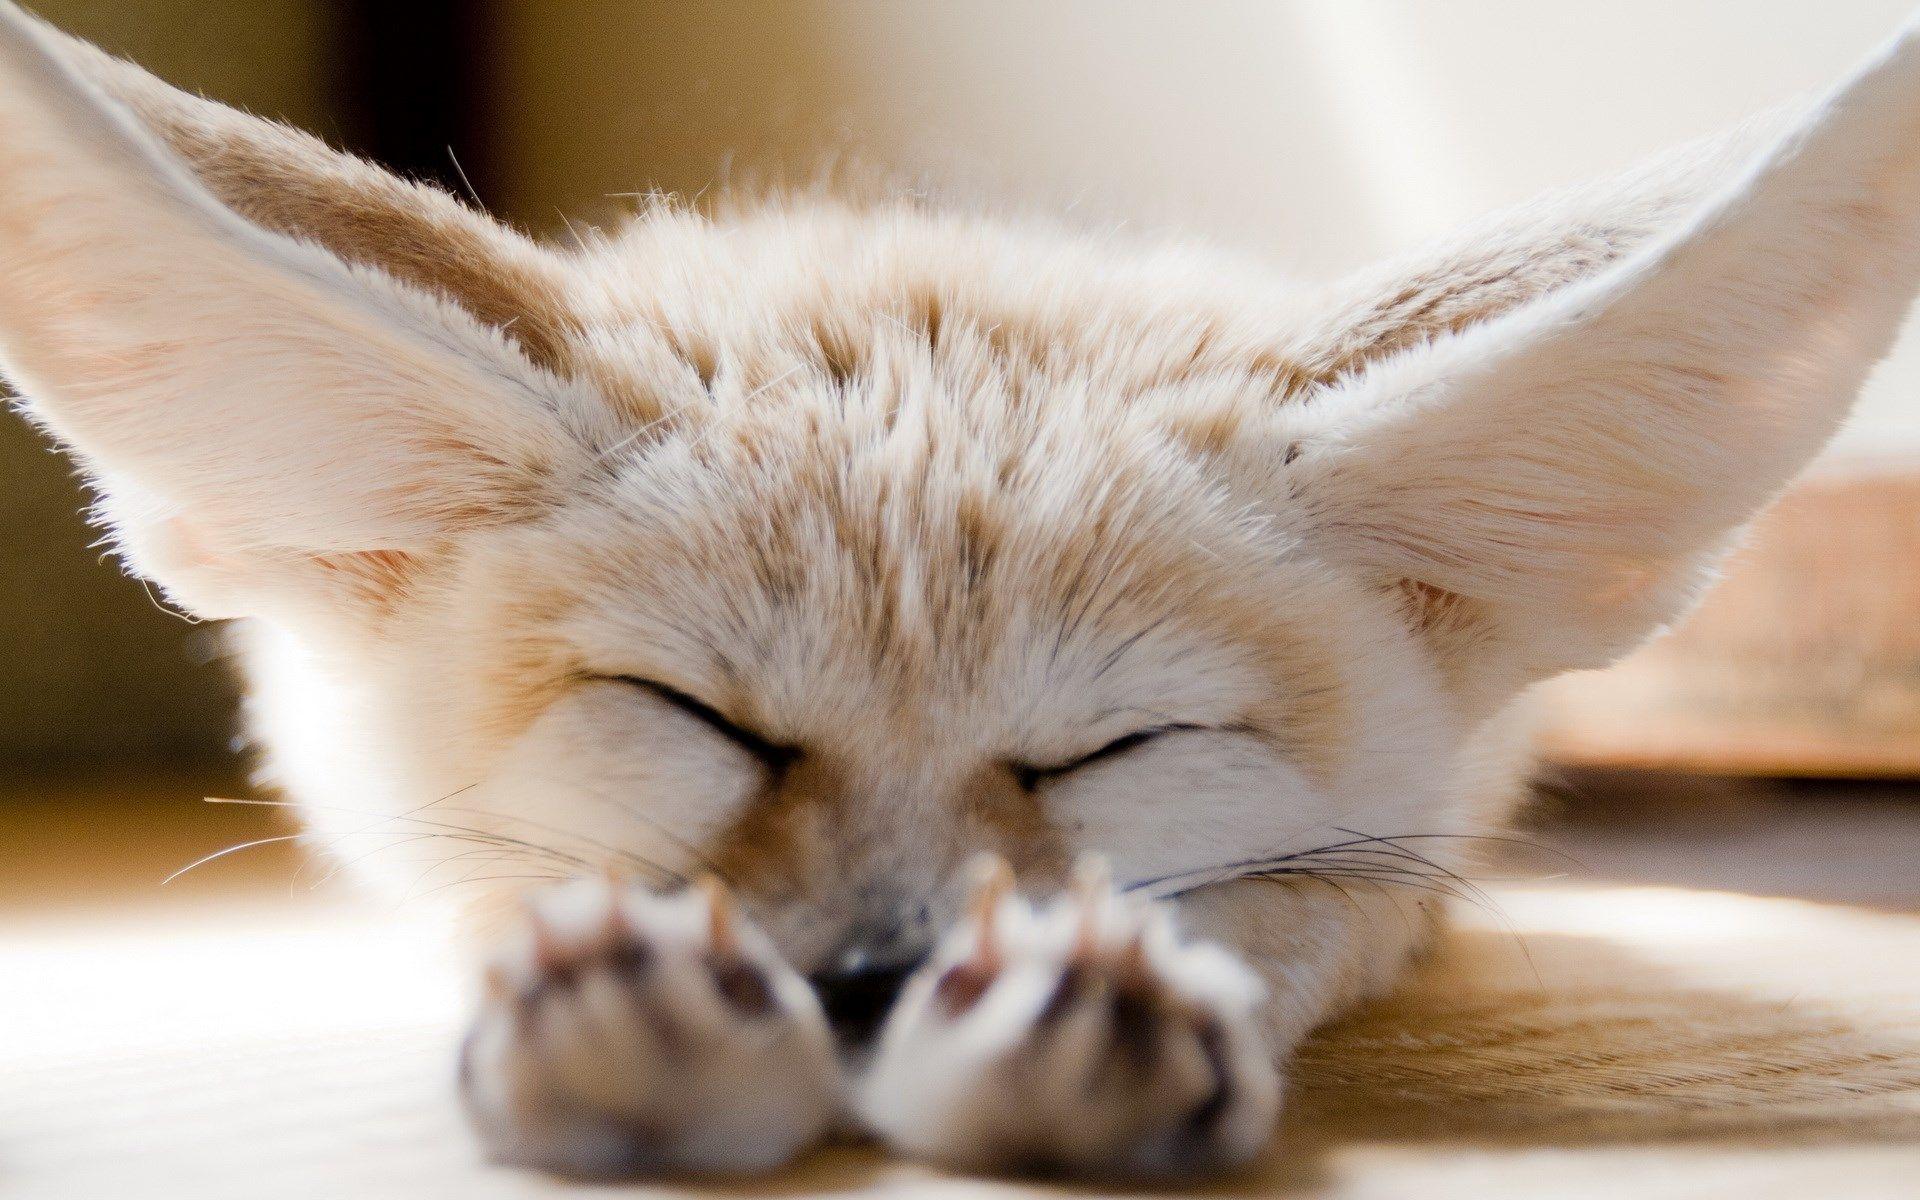 A Cute Little Fennec Fox by Vareny on DeviantArt